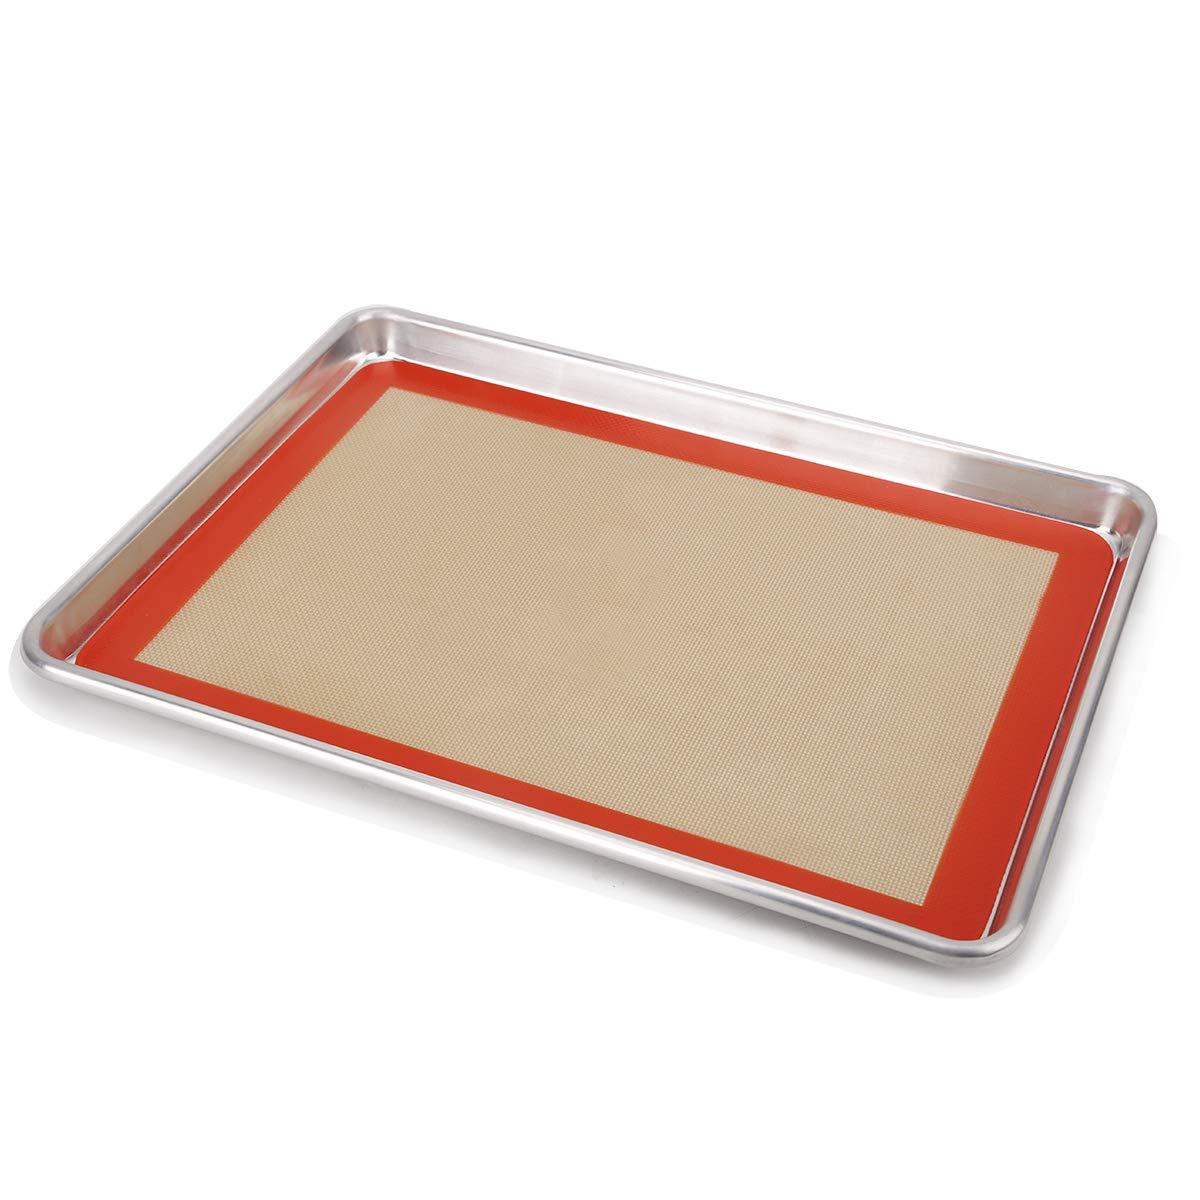 Silicone Baking Mat Set Half Sheets Cooking Macaron Pastry Mats, Non-Stick Large Liner 11 5/8 ×16 1/2 by HANTAJANSS